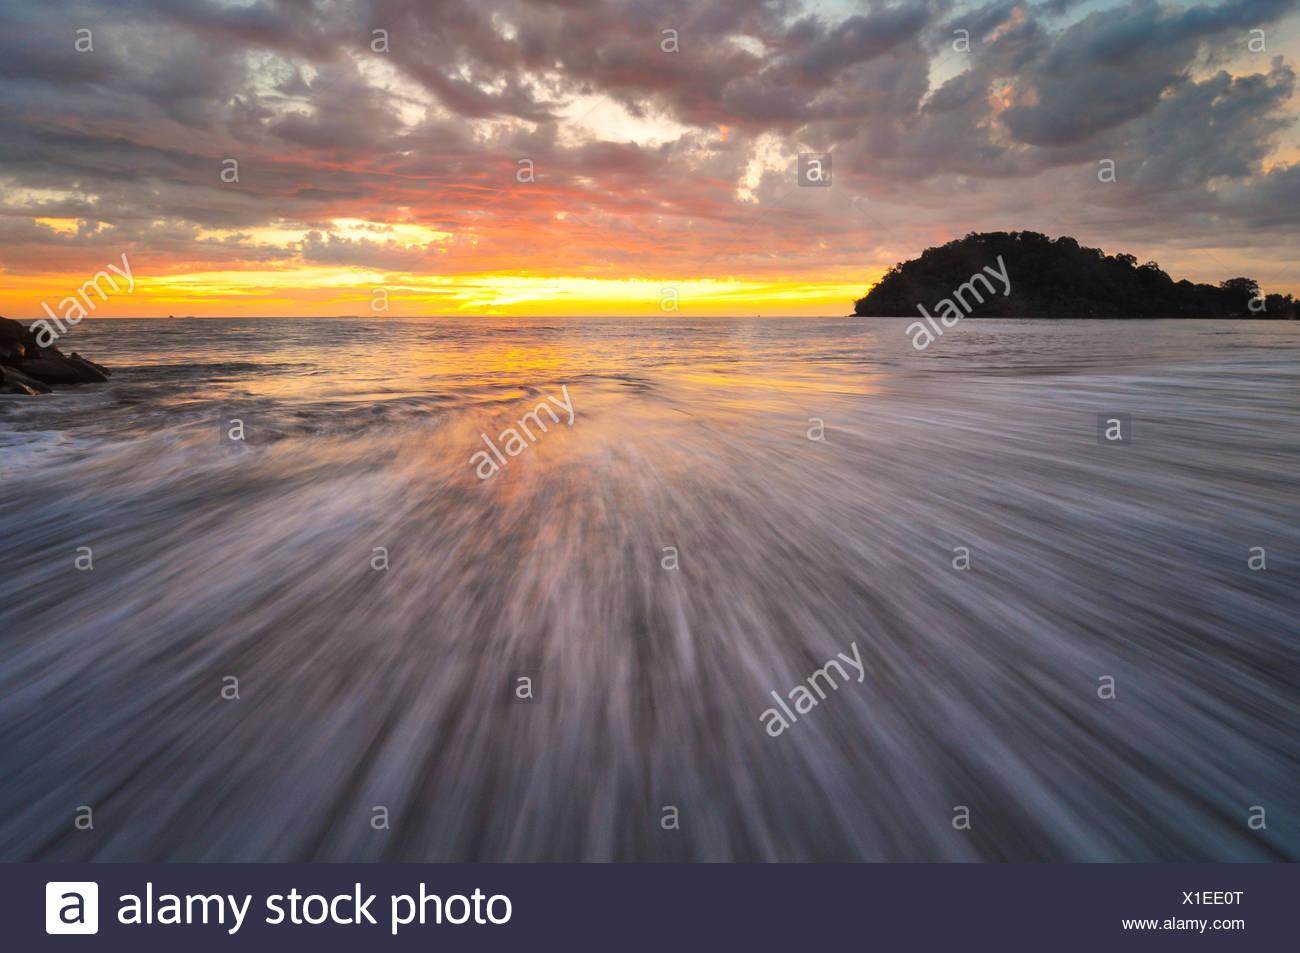 Indonesia Padang, Taplau Beach, onda e al tramonto Immagini Stock